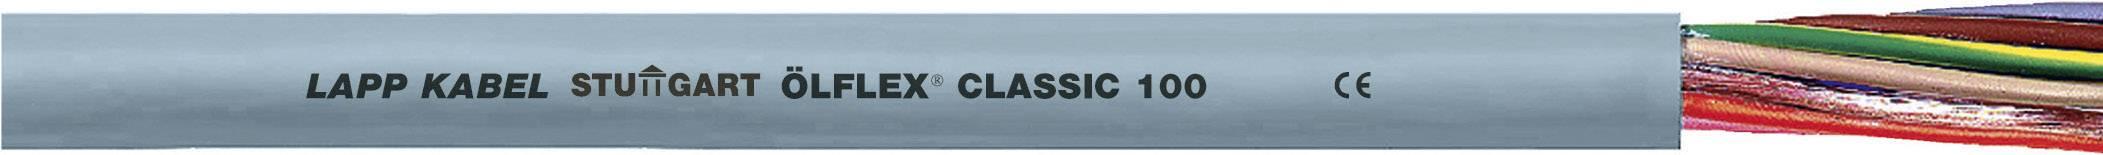 Kabel LappKabel Ölflex CLASSIC 100 2X2,5 (0010086), PVC, 8,9 mm, 750 V, šedá, 100 m